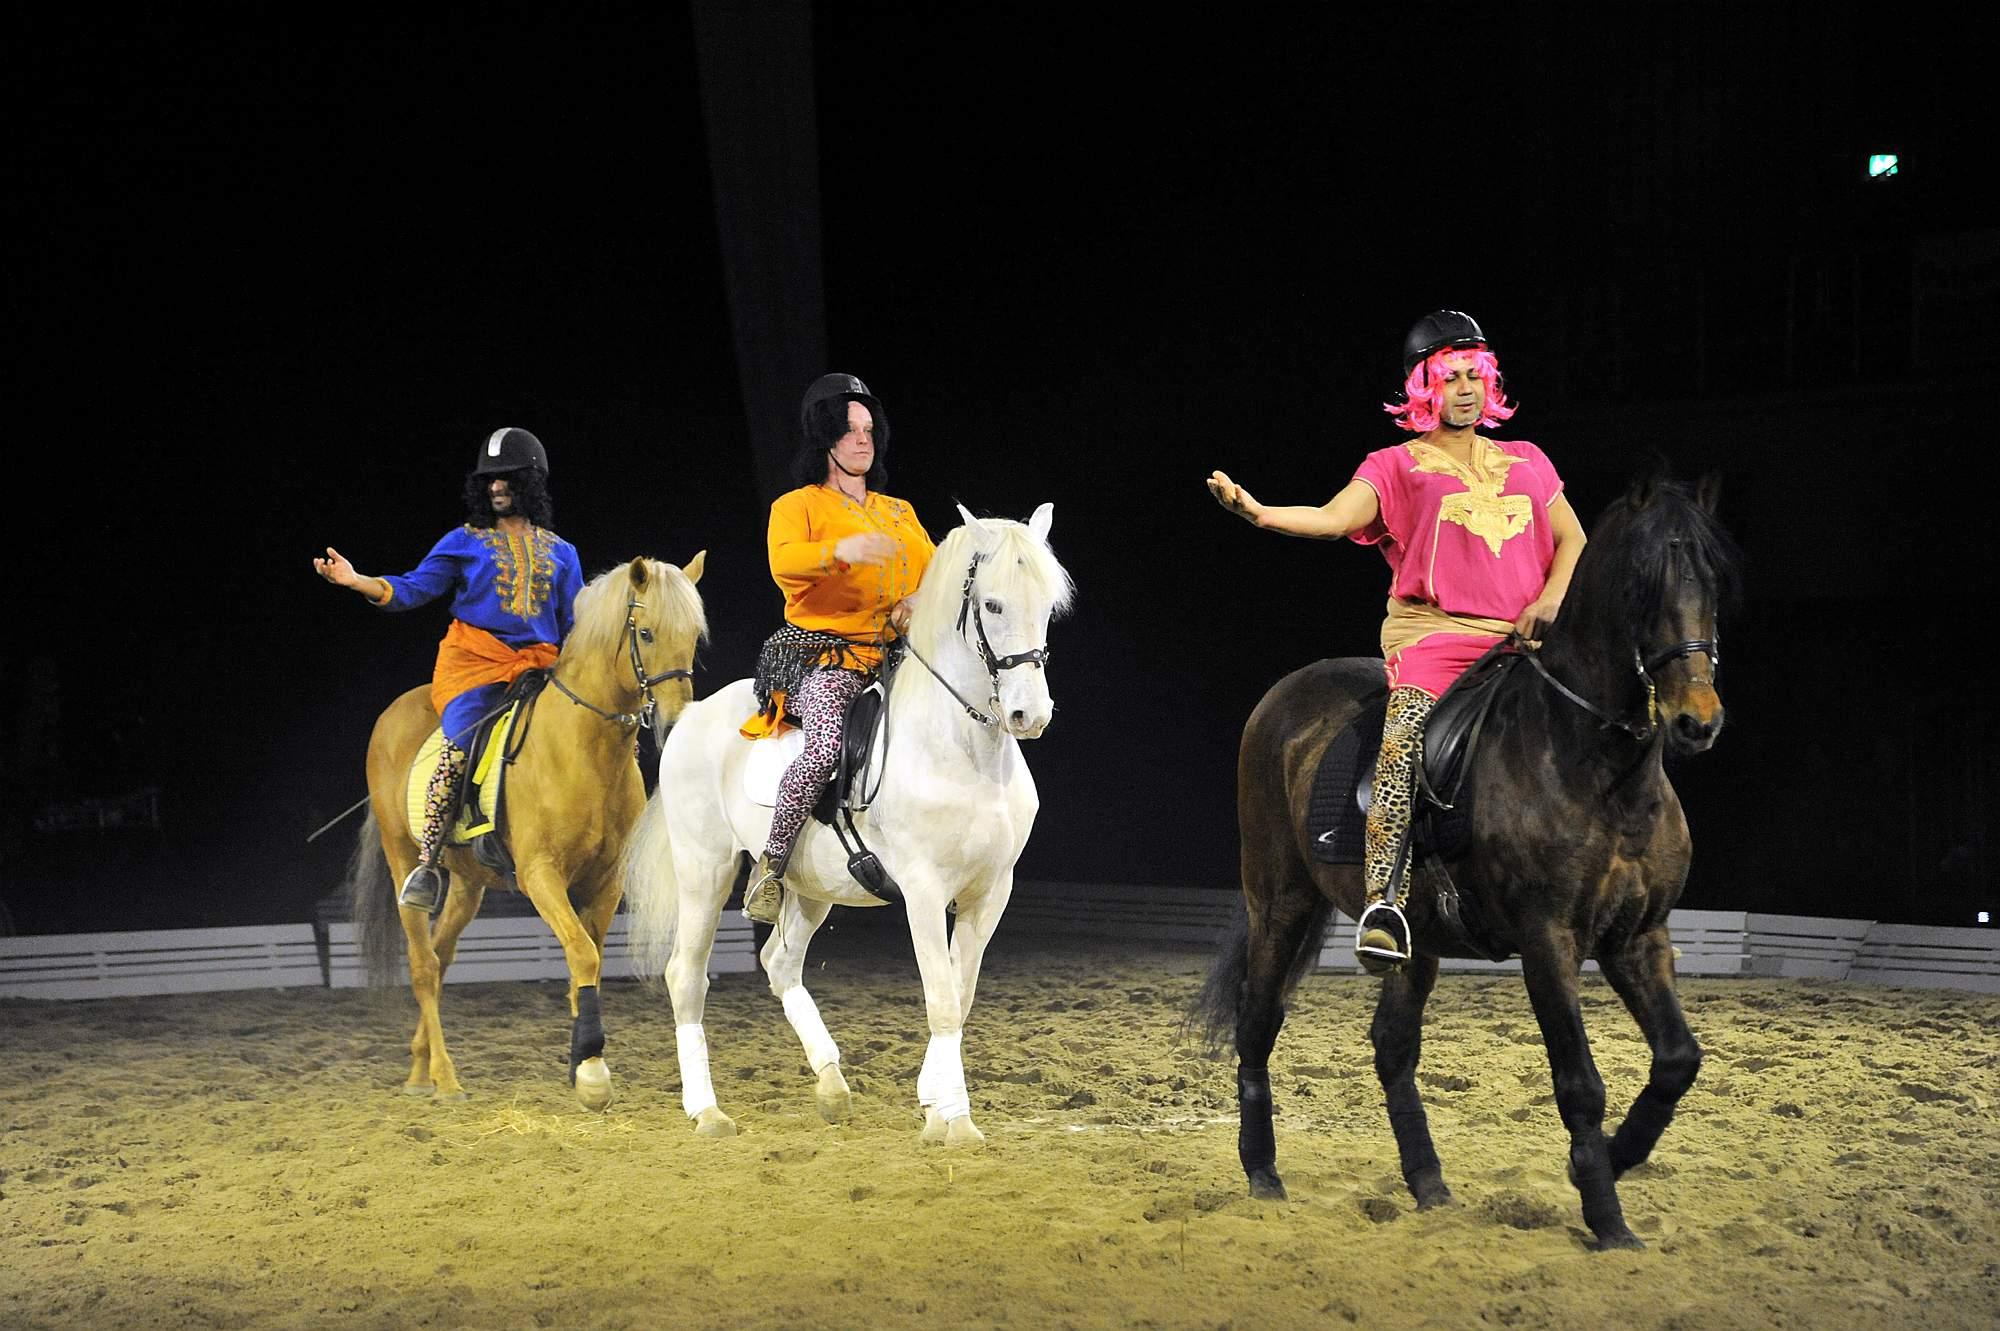 The Royal Horse Gala in der Stadthalle Rostock. Foto: Joachim Kloock